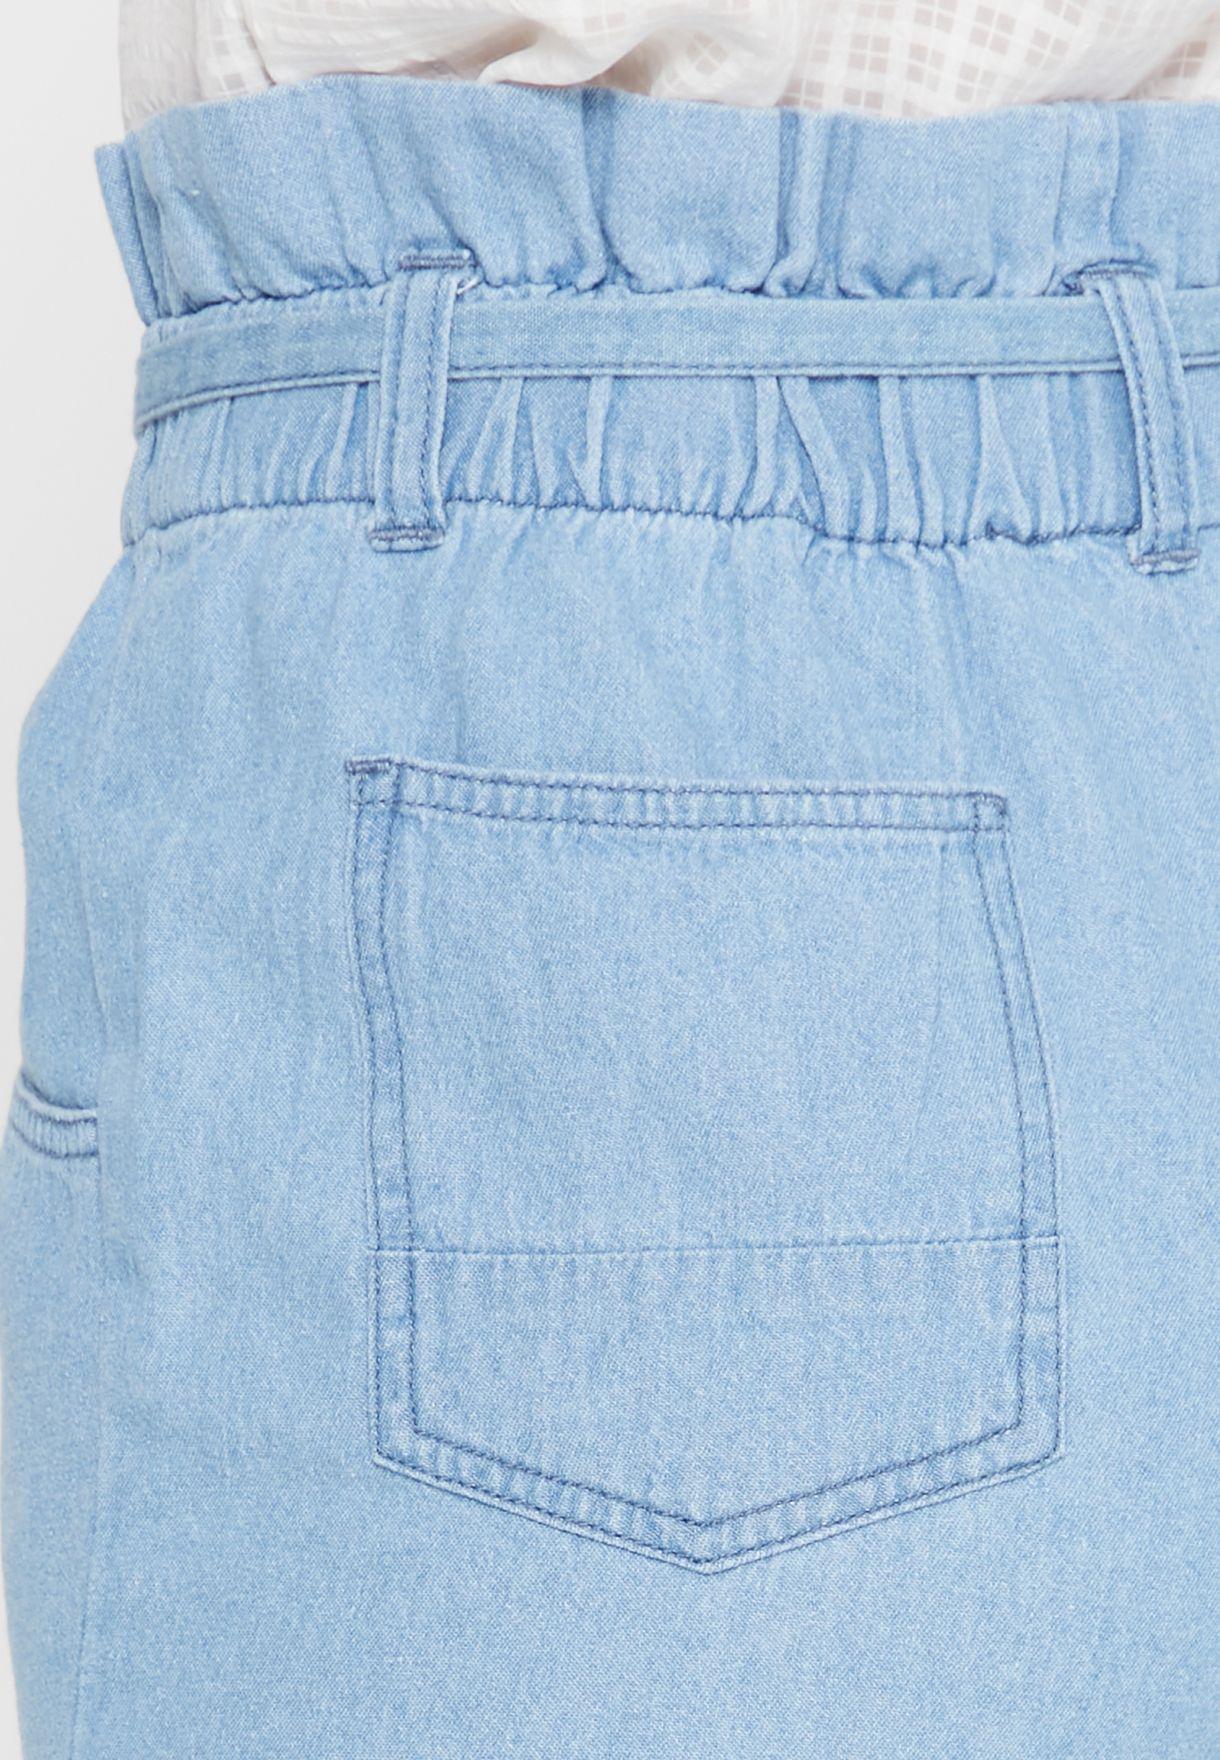 Ruffle Waist Tie Denim Shorts